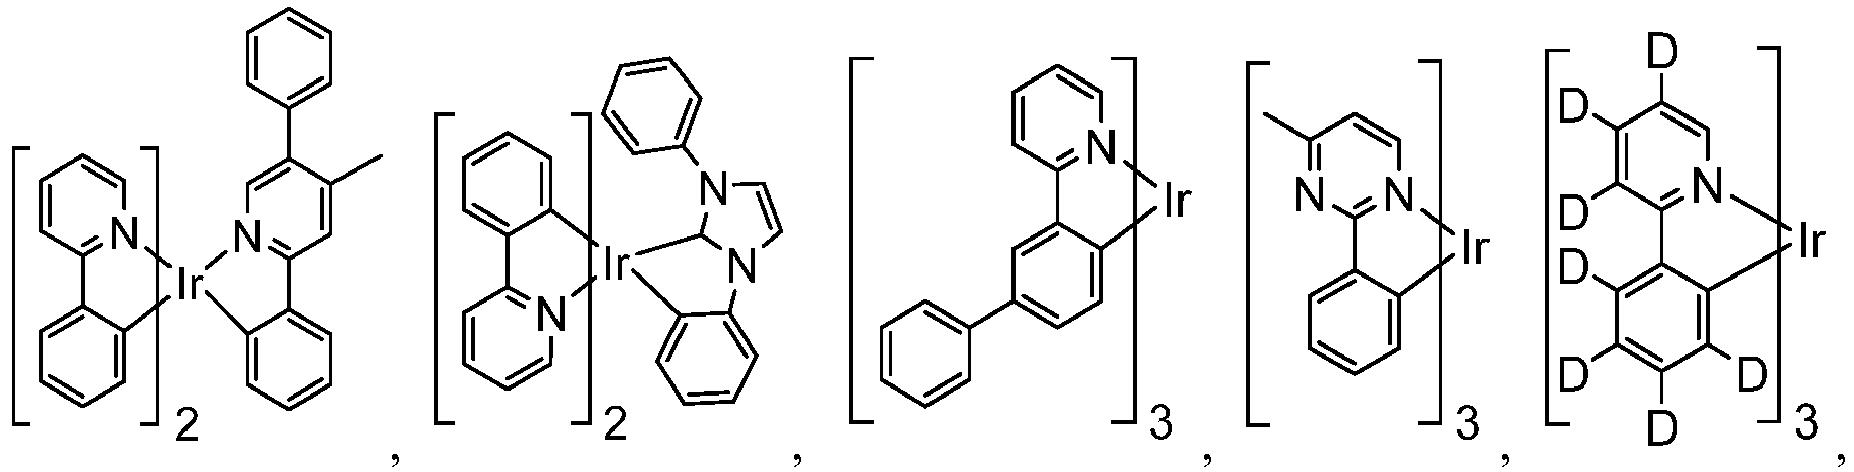 Figure imgb0913